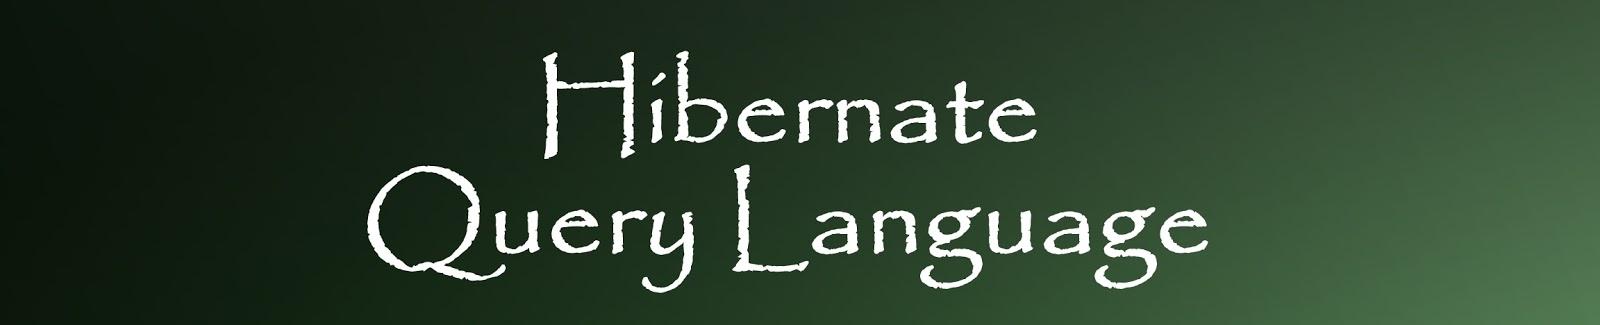 Hibernate Query Language (HQL) - Way To Easy Learn